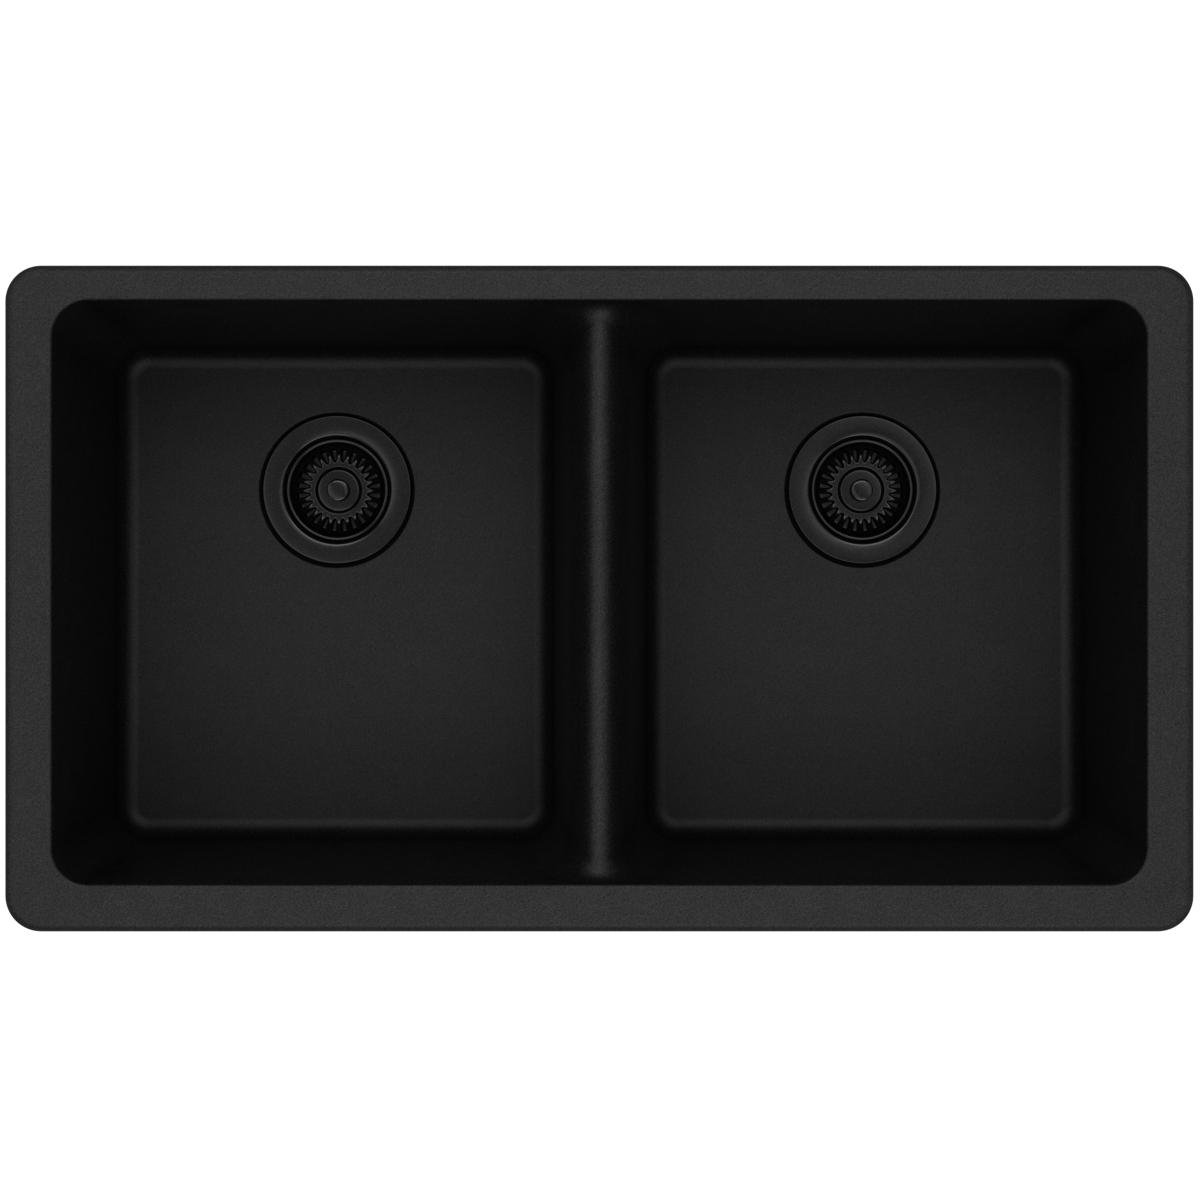 Elkay ELGU3322BK0 Gourmet Quartz Classic Undermount Sink, Black